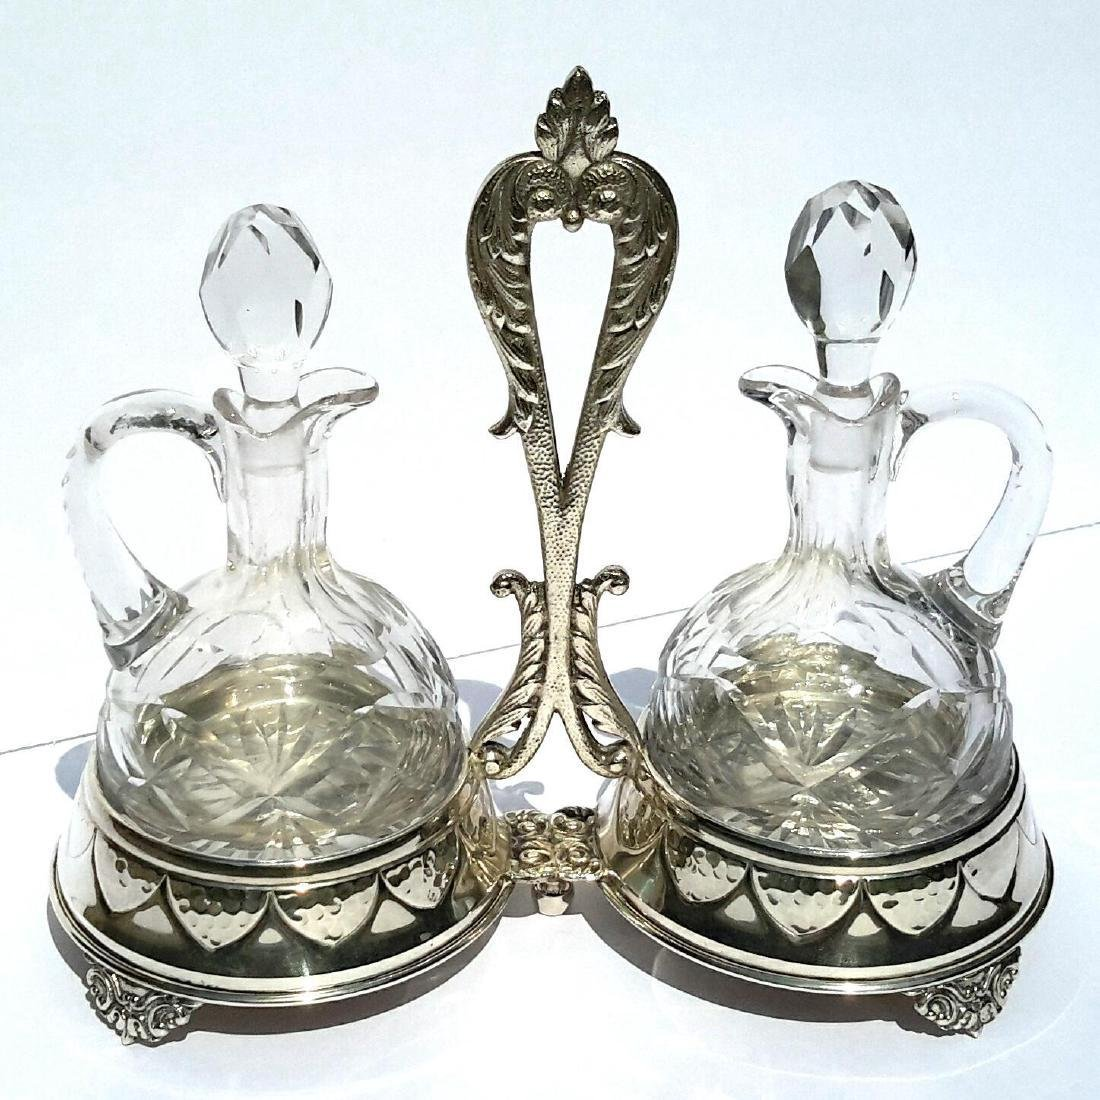 Vintage Spanish Silverplate Cut Crystal Cruit Set